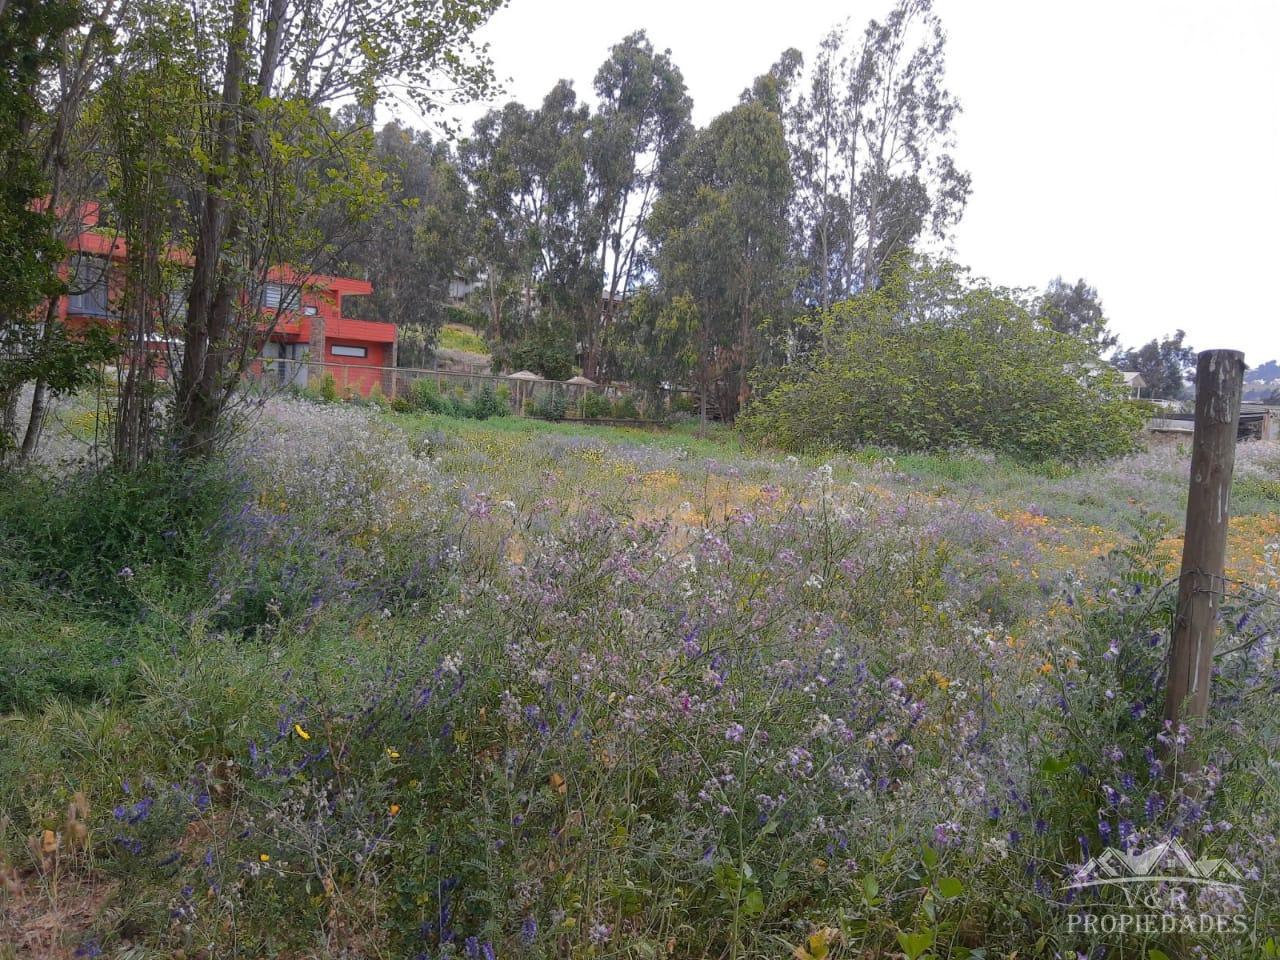 Vendo Terreno de 3800 m2 en Maitencillo